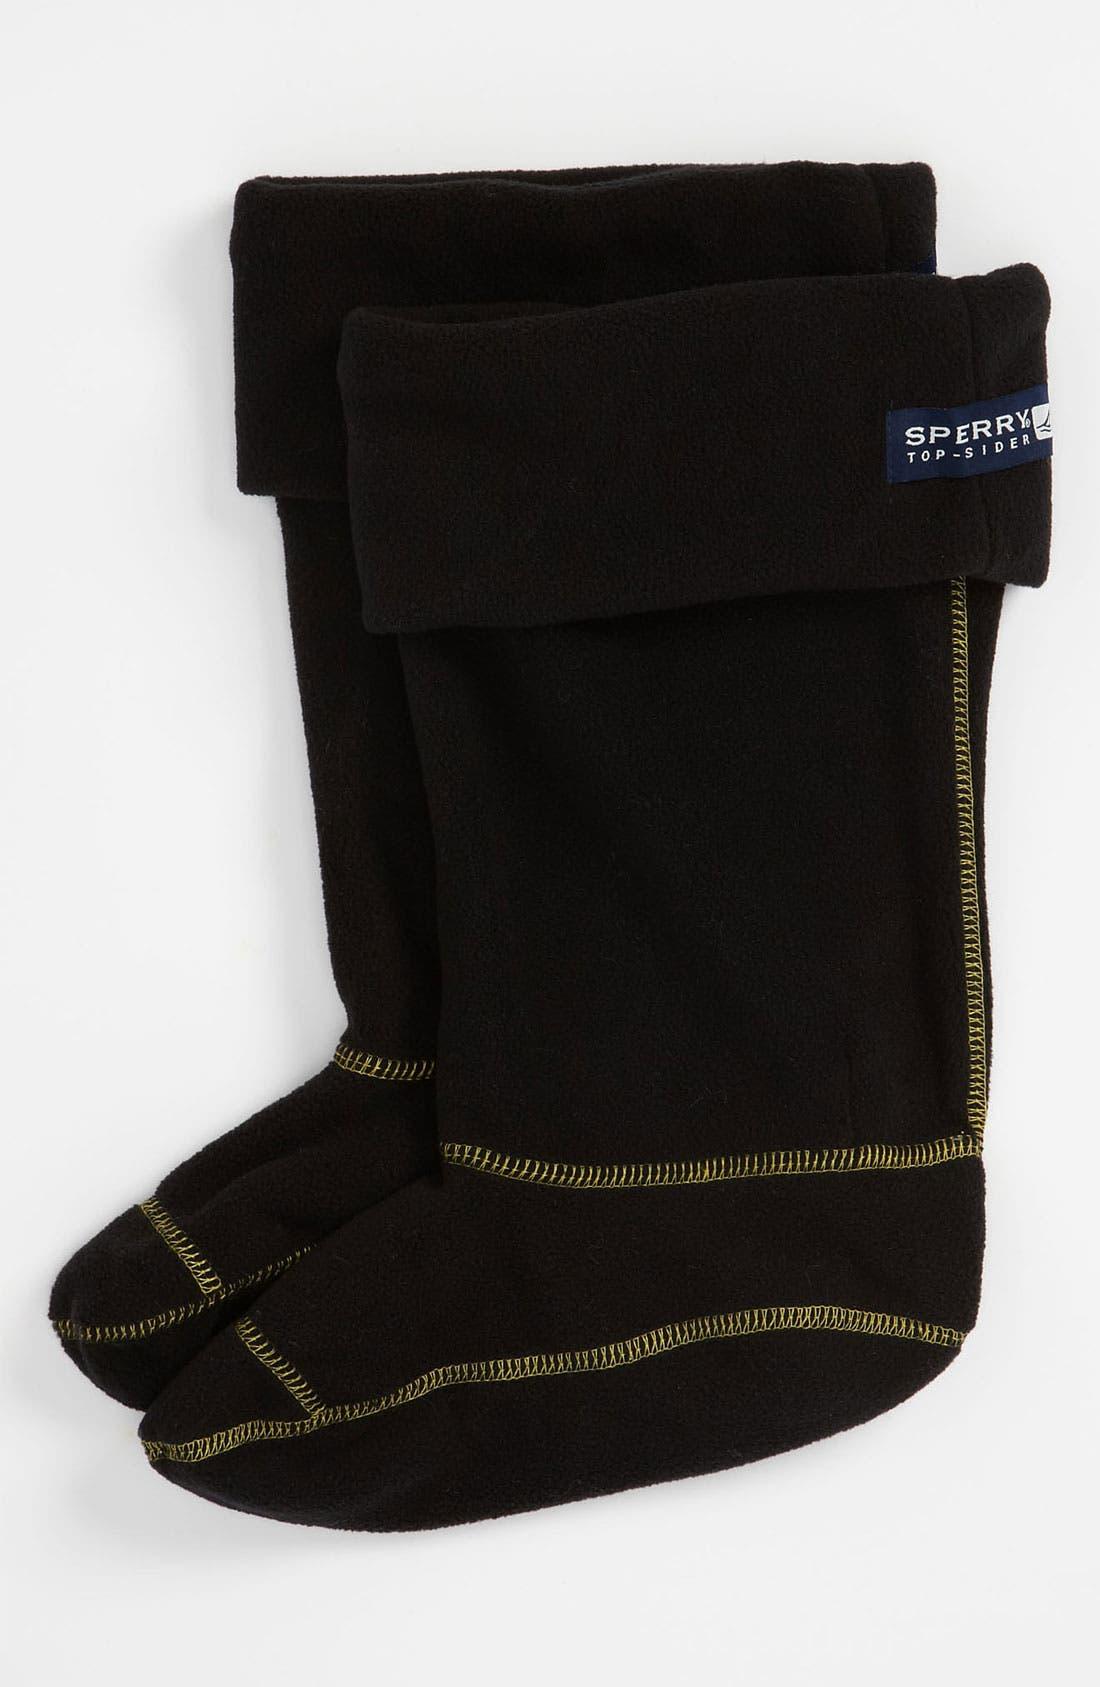 Main Image - Sperry Top-Sider® Rain Boot Socks